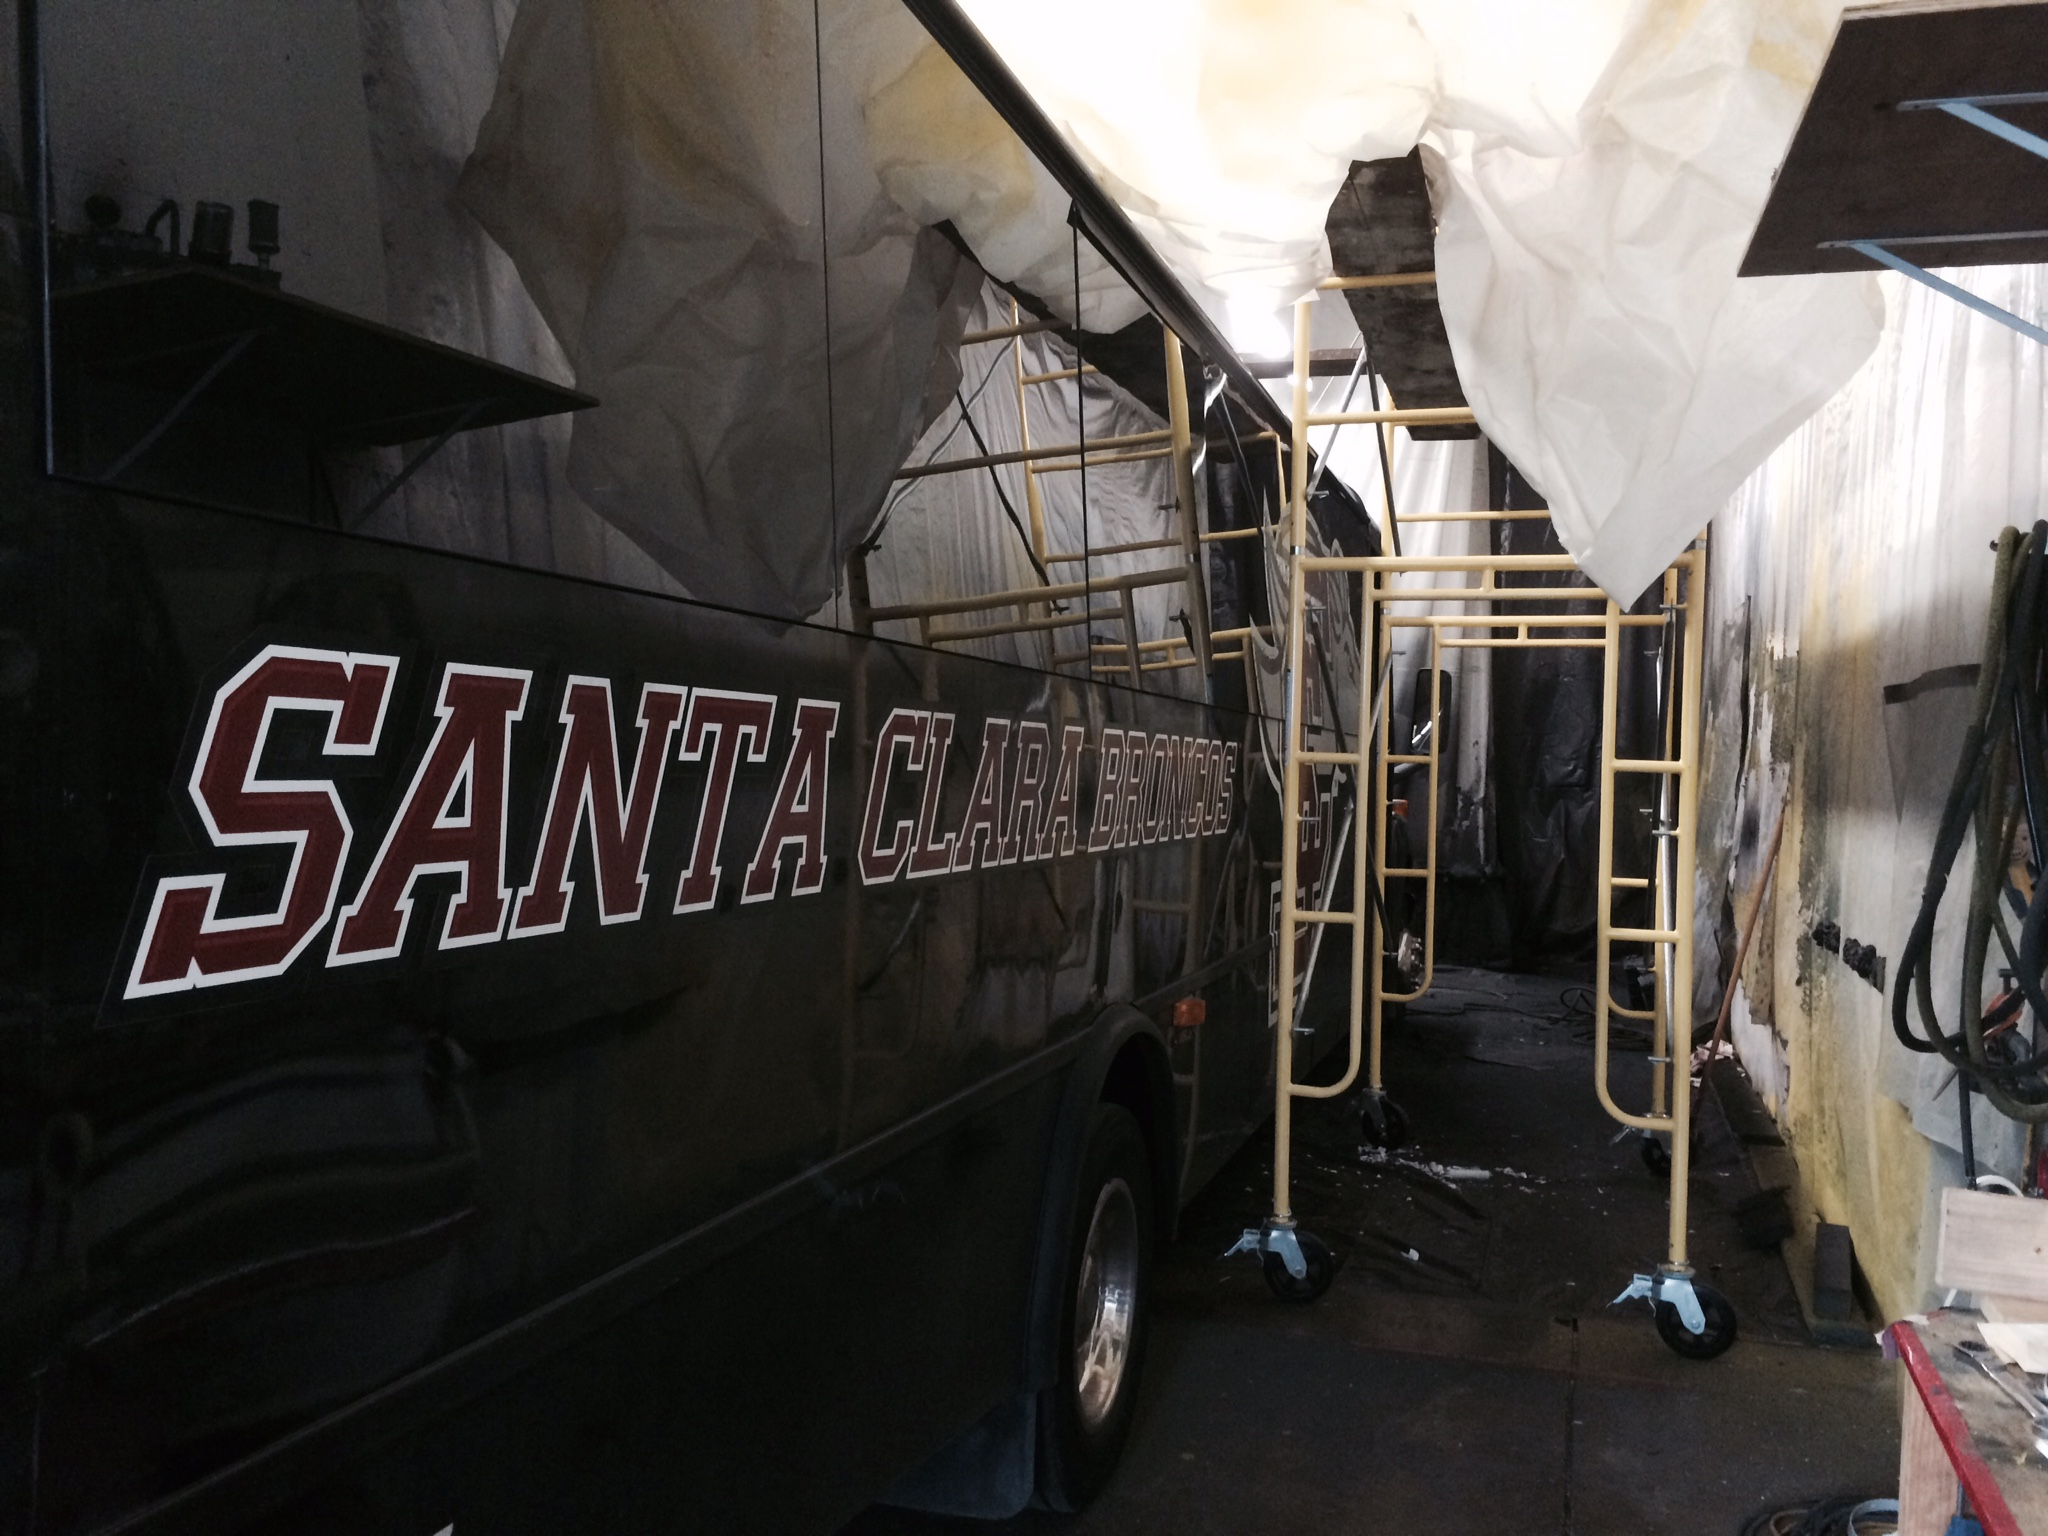 Santa Clara University Bus gets Polyurea 'd